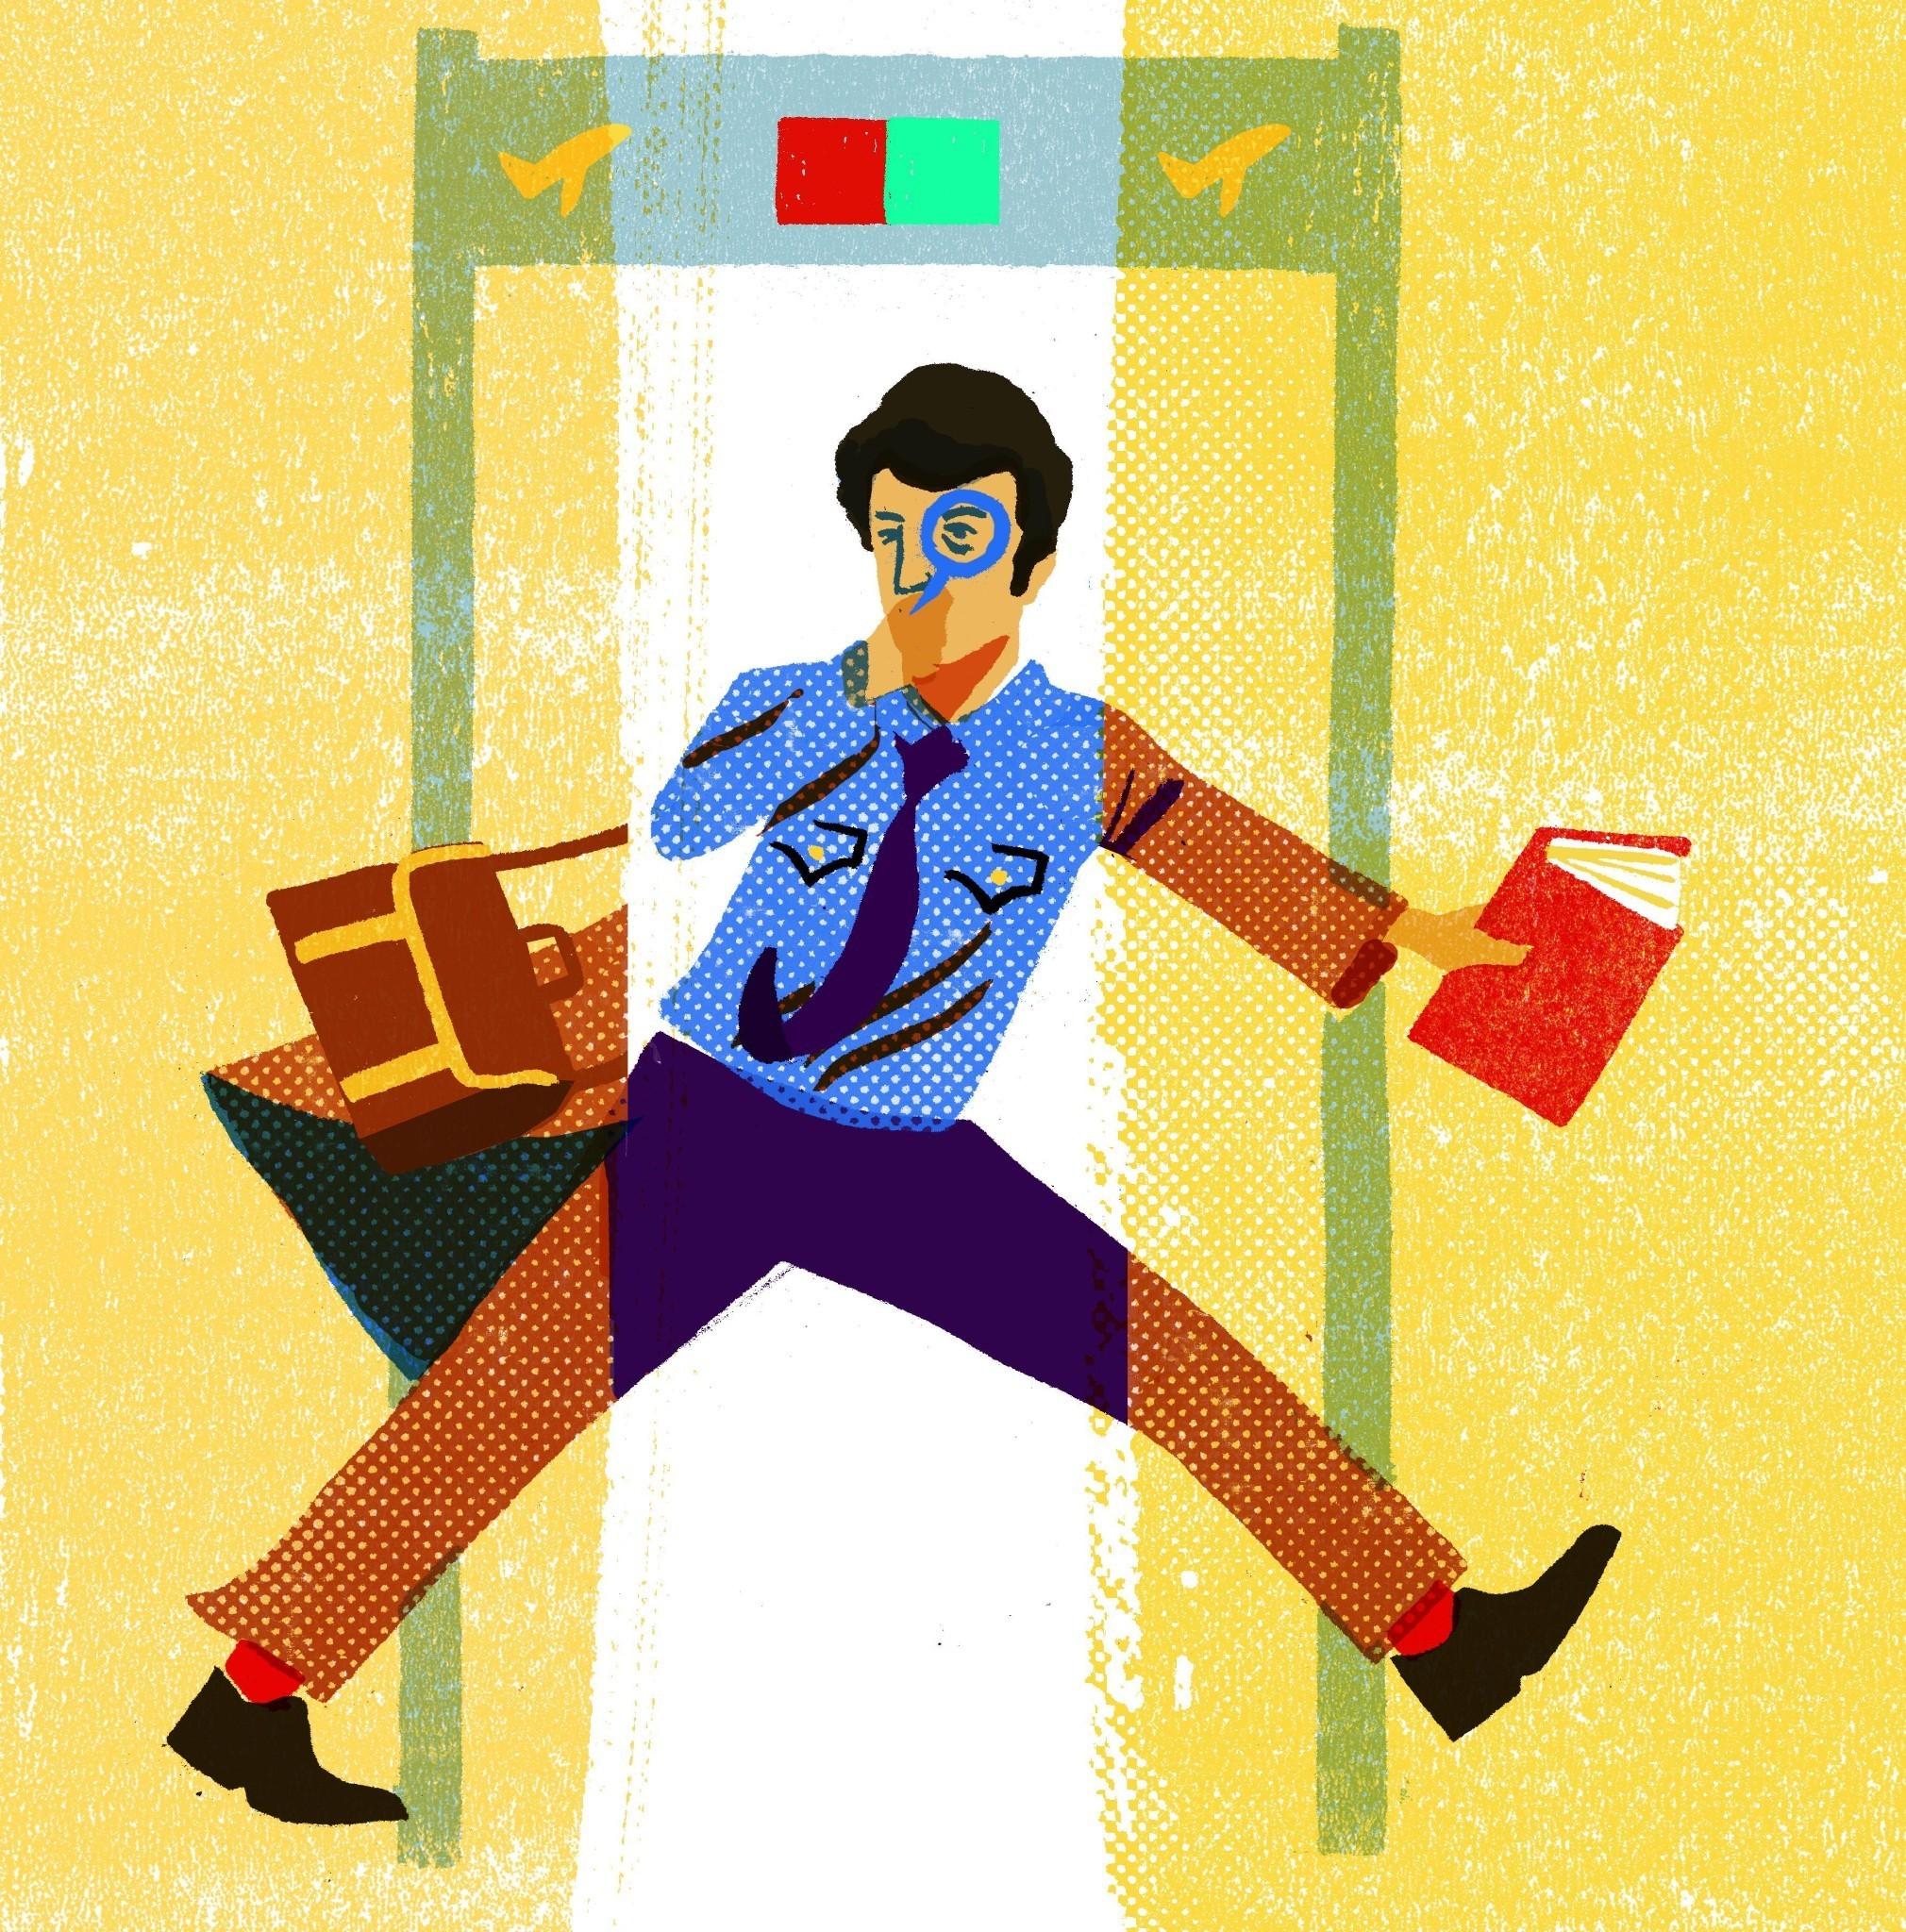 My (short) life as an airport security guard